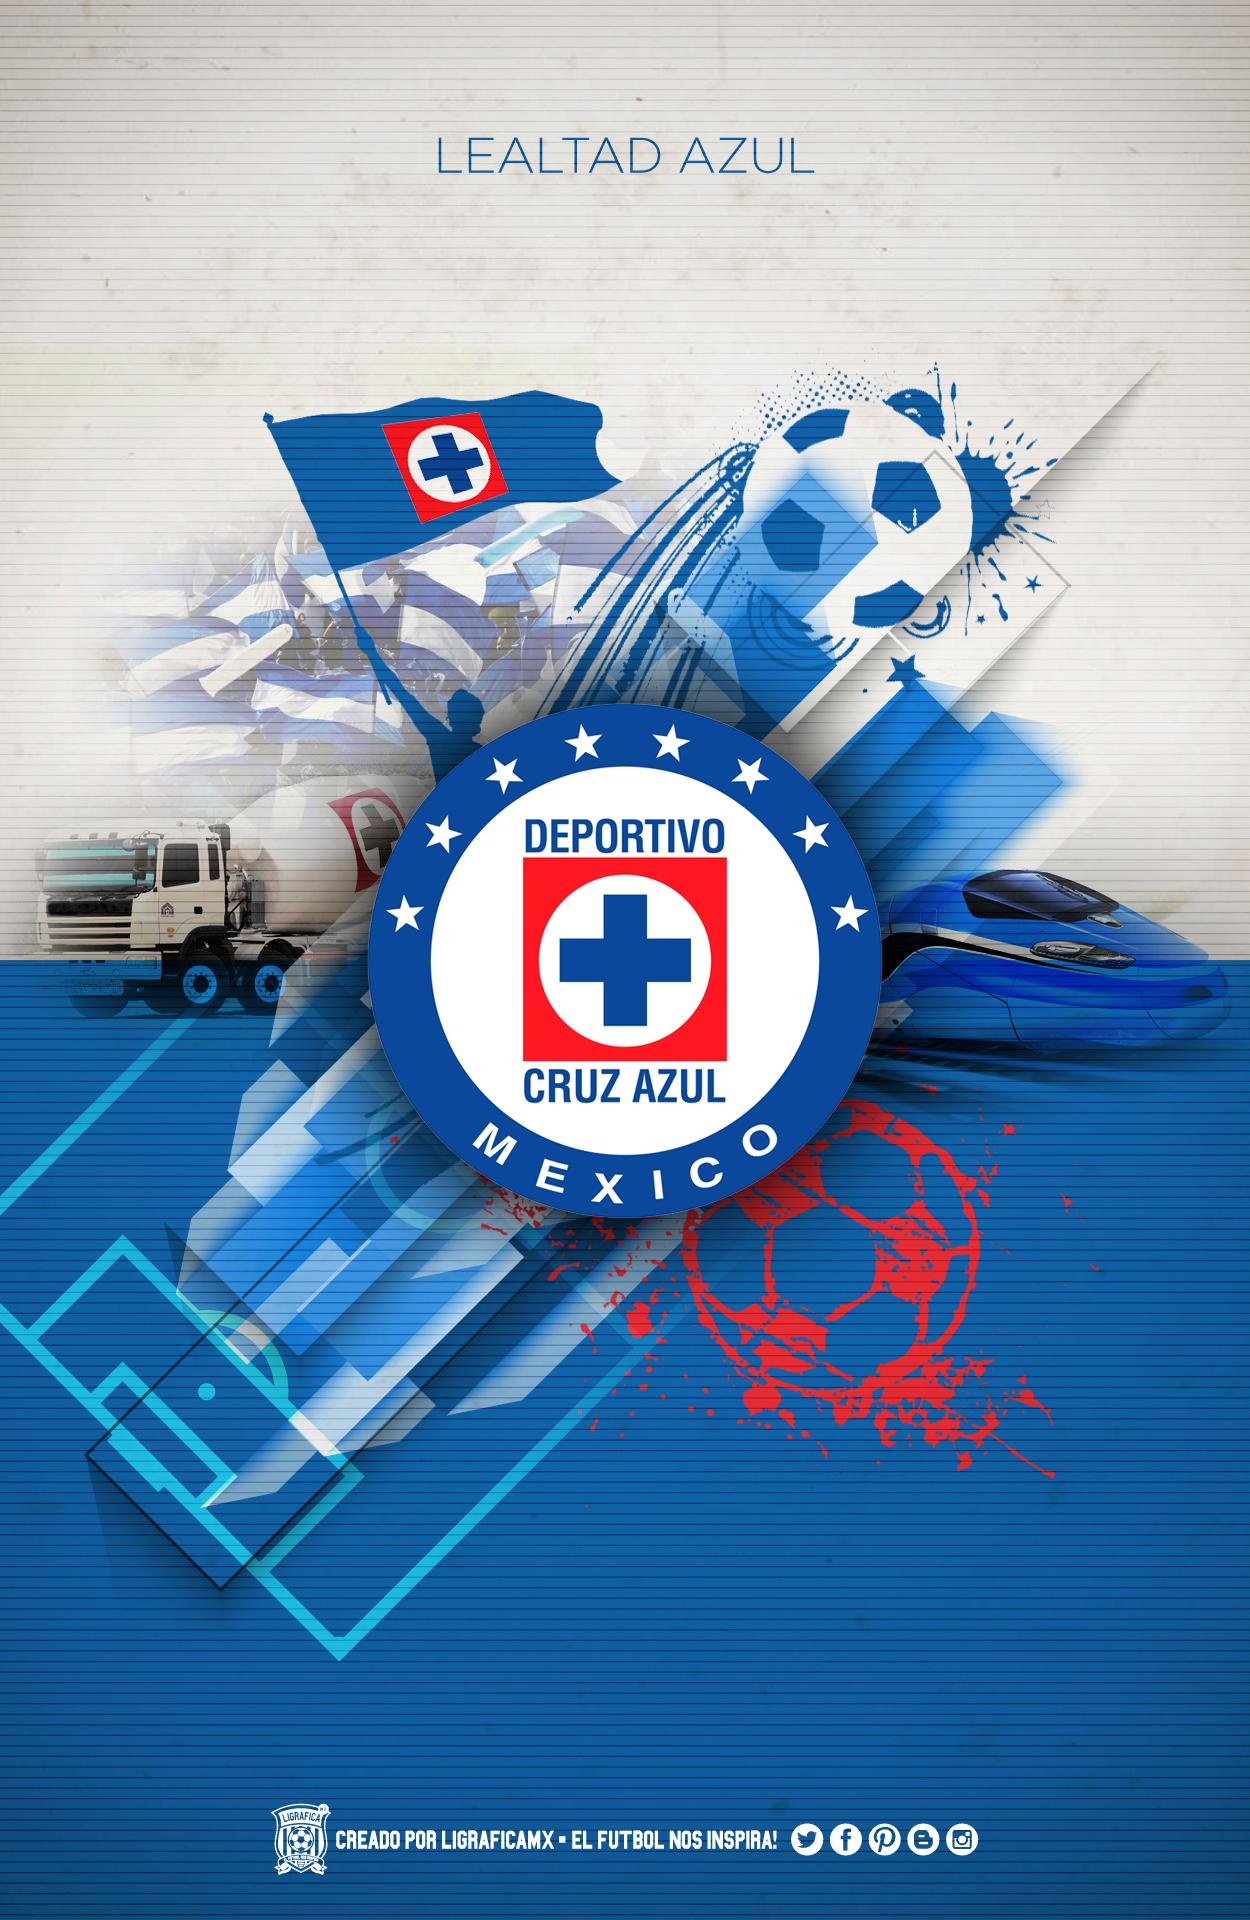 Patriots Wallpaper Hd Cruzazul Ligraficamx 14 04 15ctg Cruz Azul Pinterest